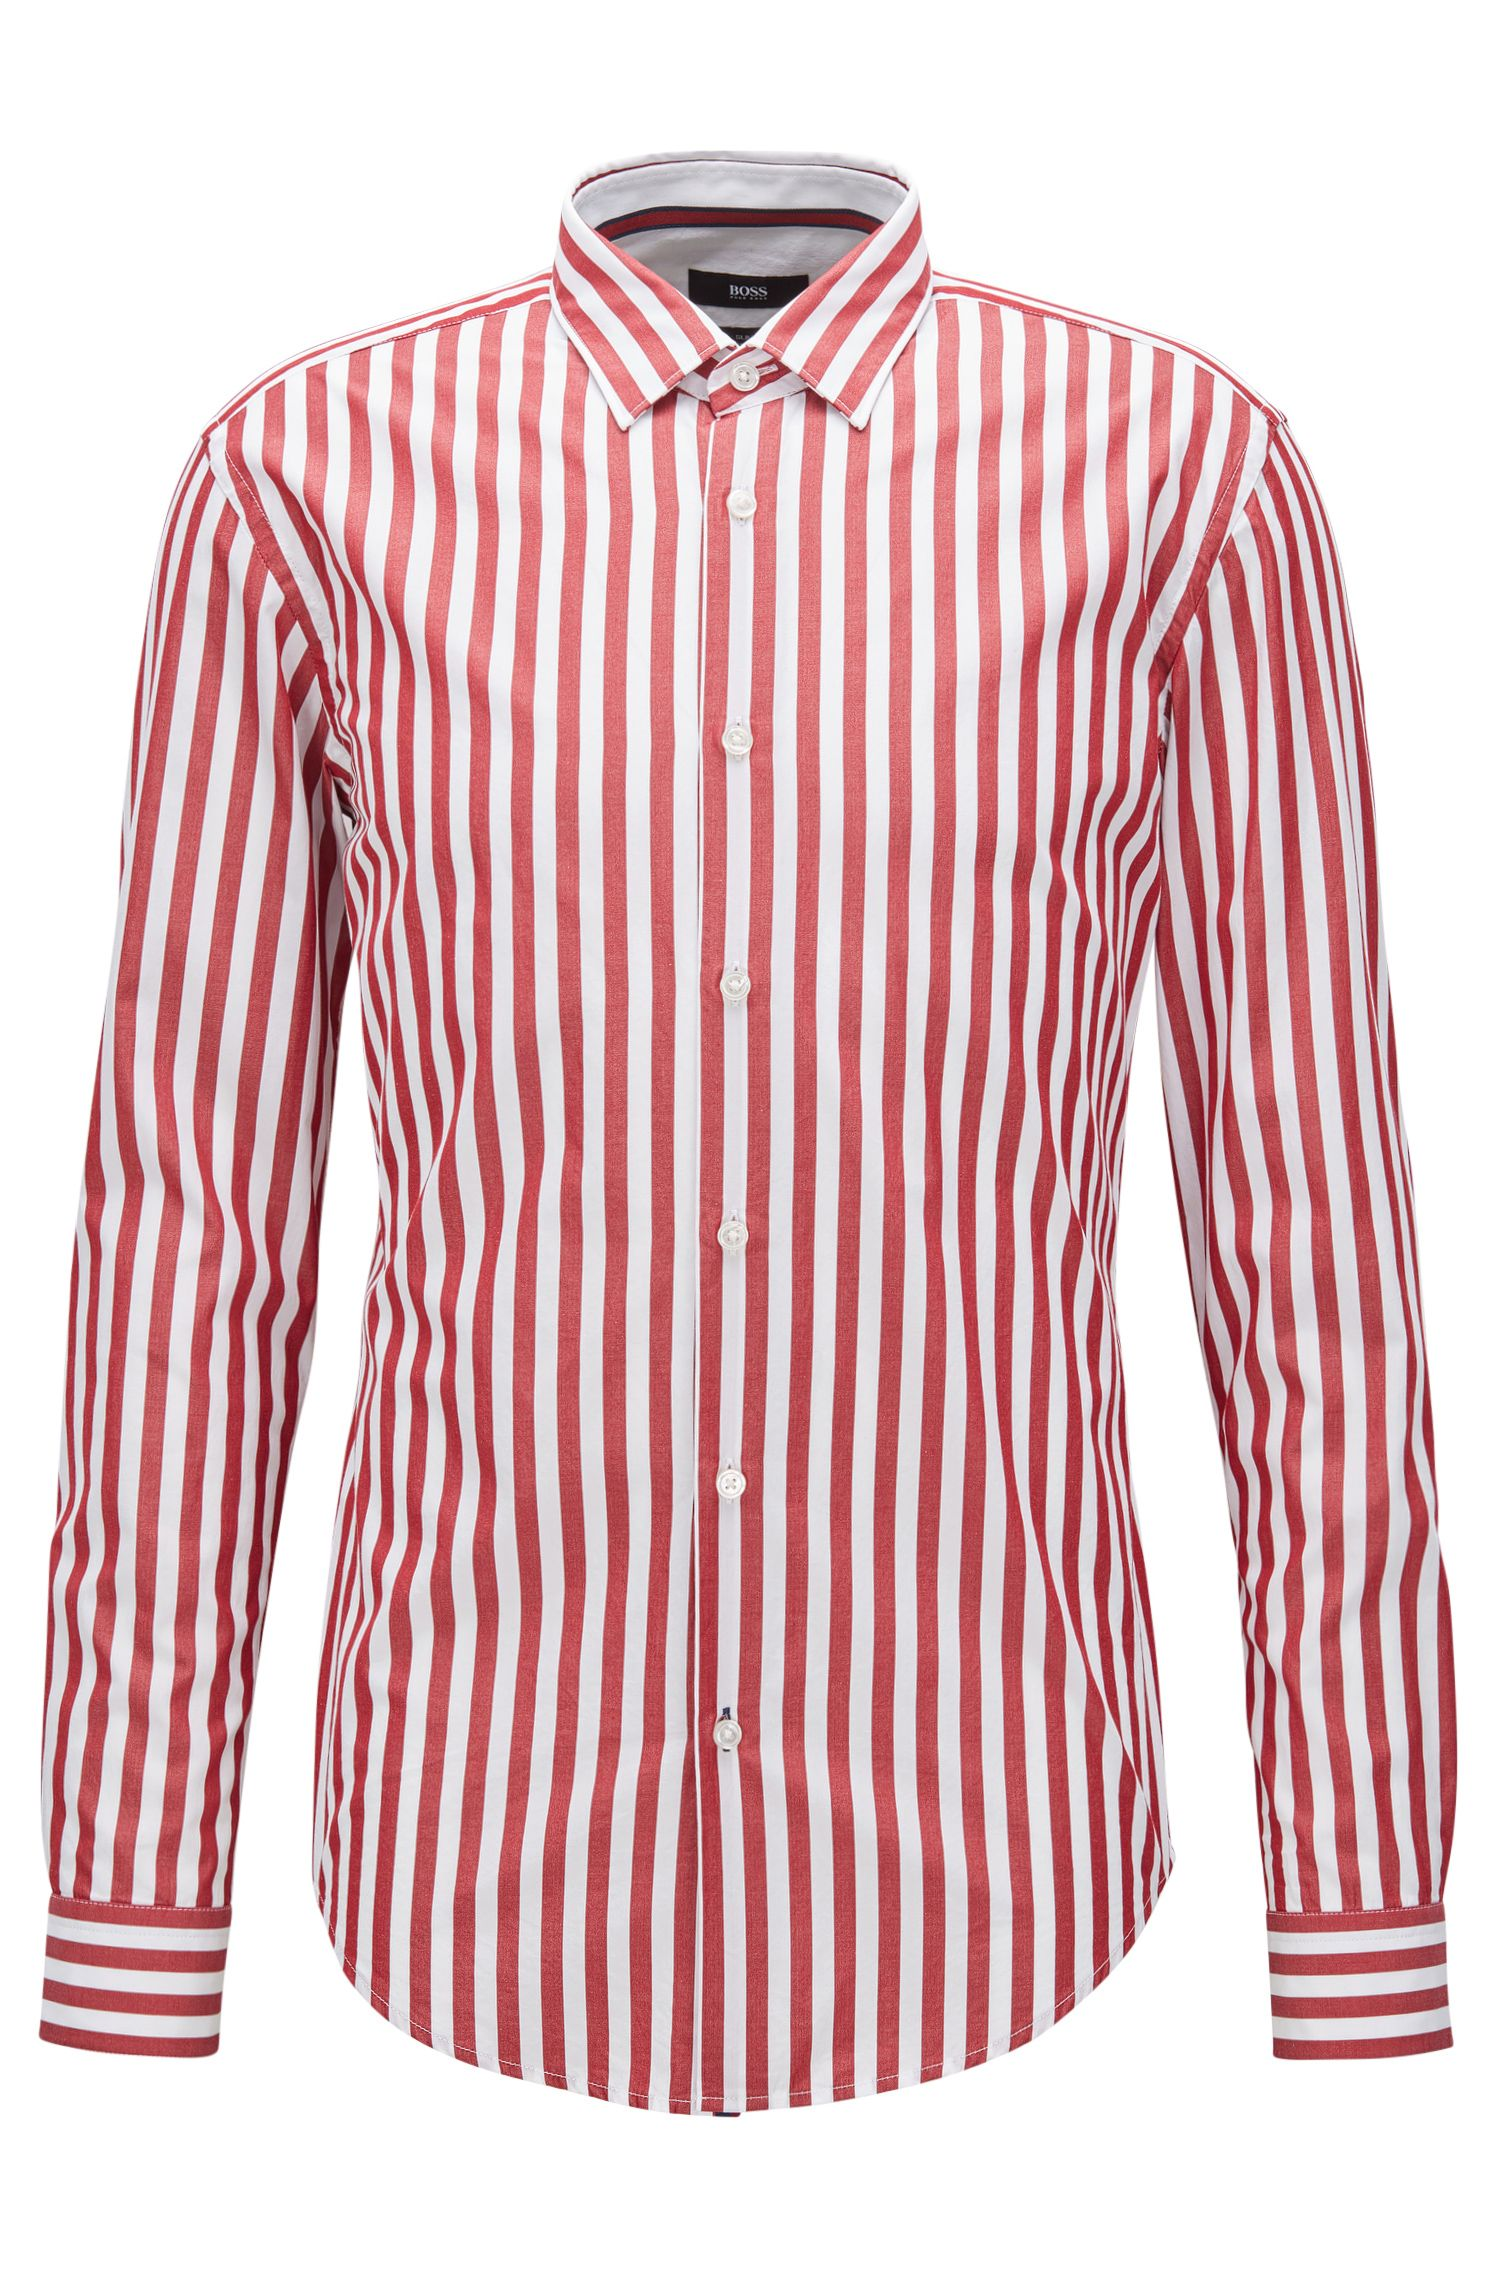 Cotton Button Down Shirt, Slim Fit   Ronni